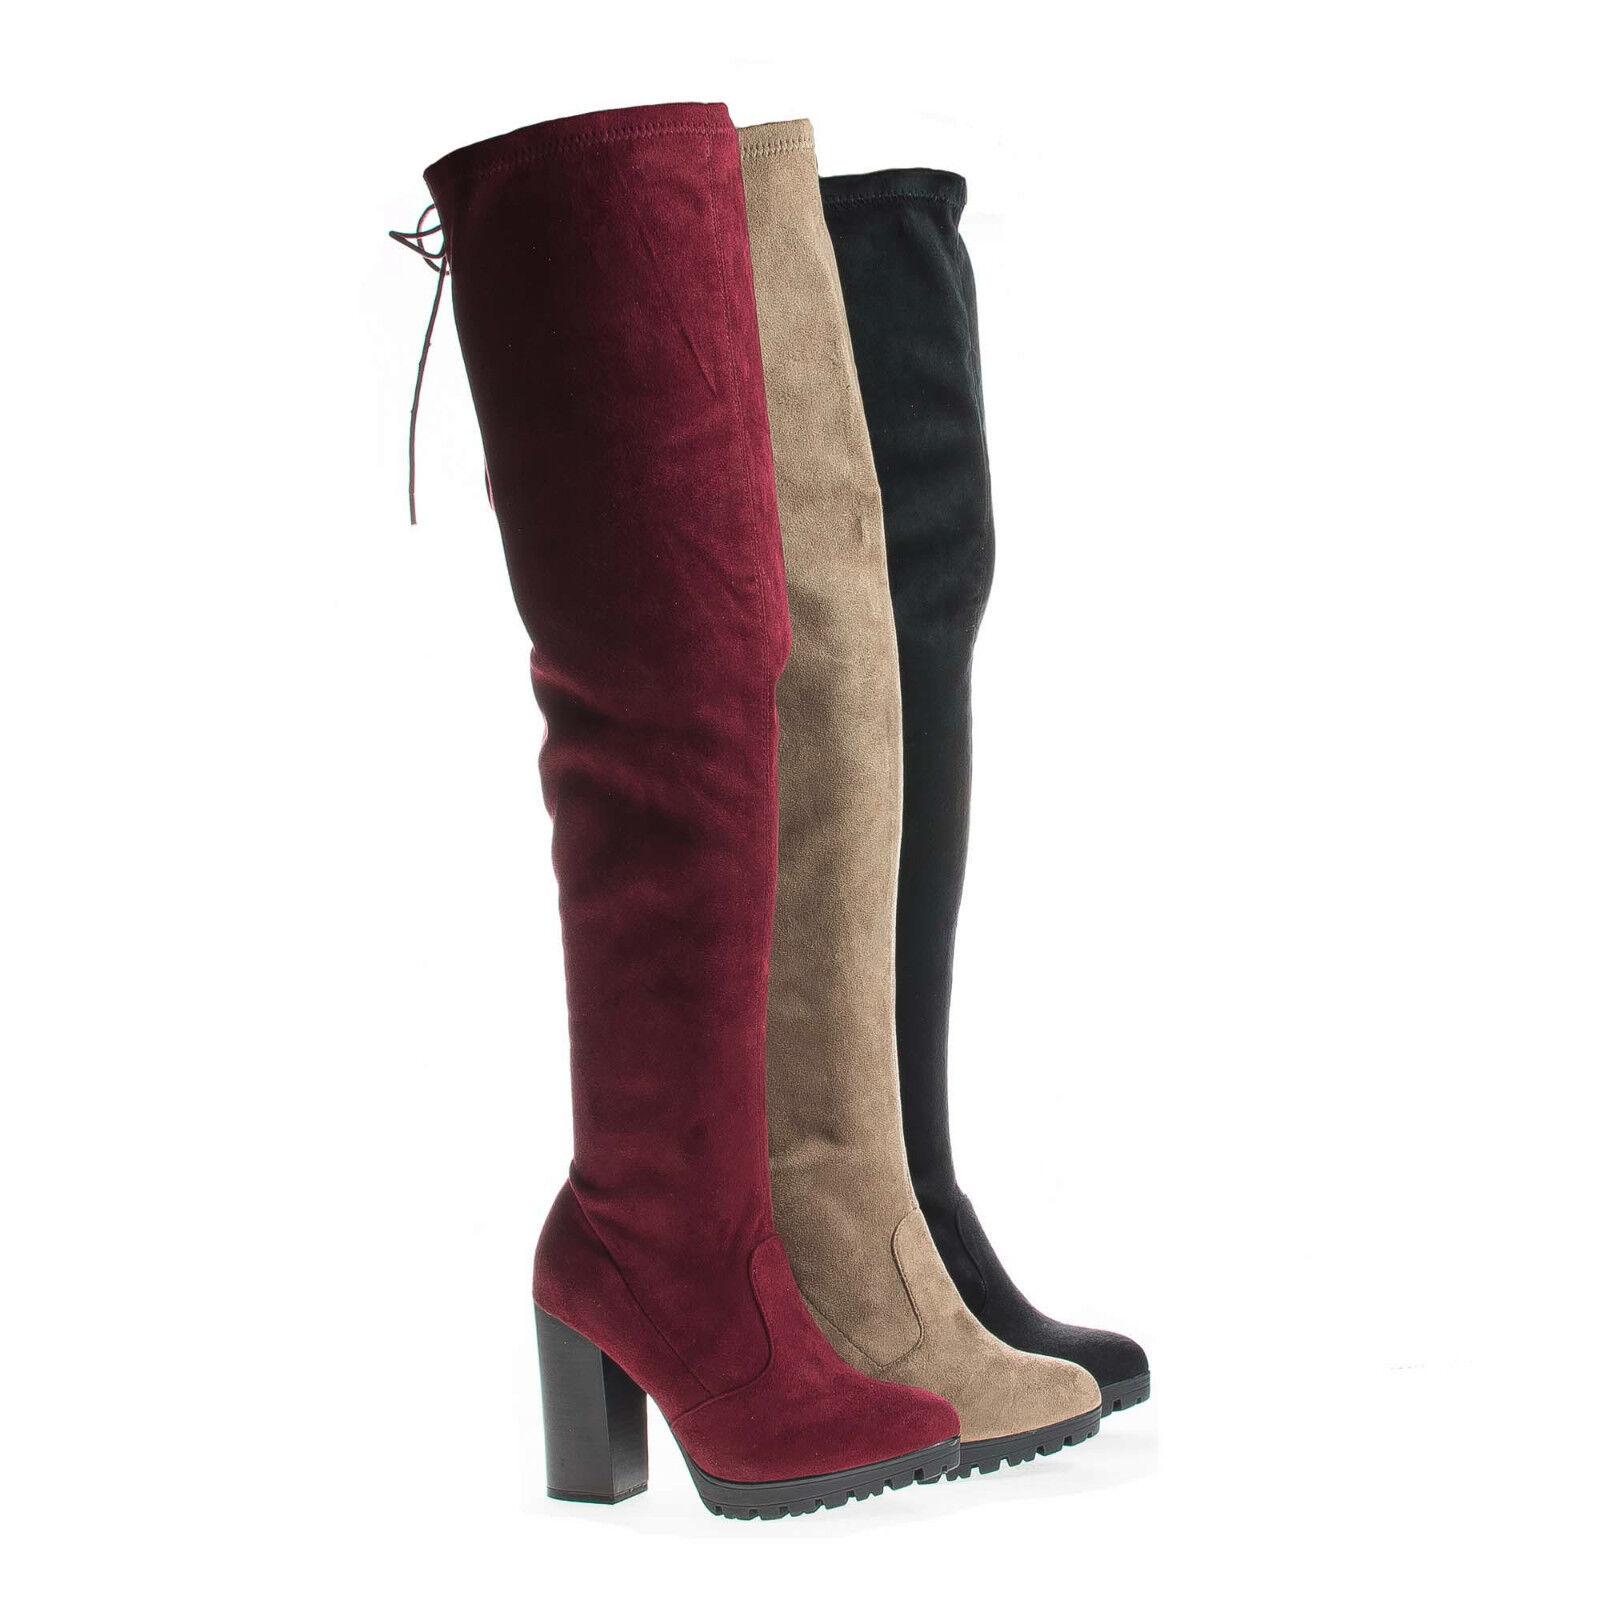 Kimber09 Thigh High Corset Shaft Lug Sole Platform Block Heel Boots